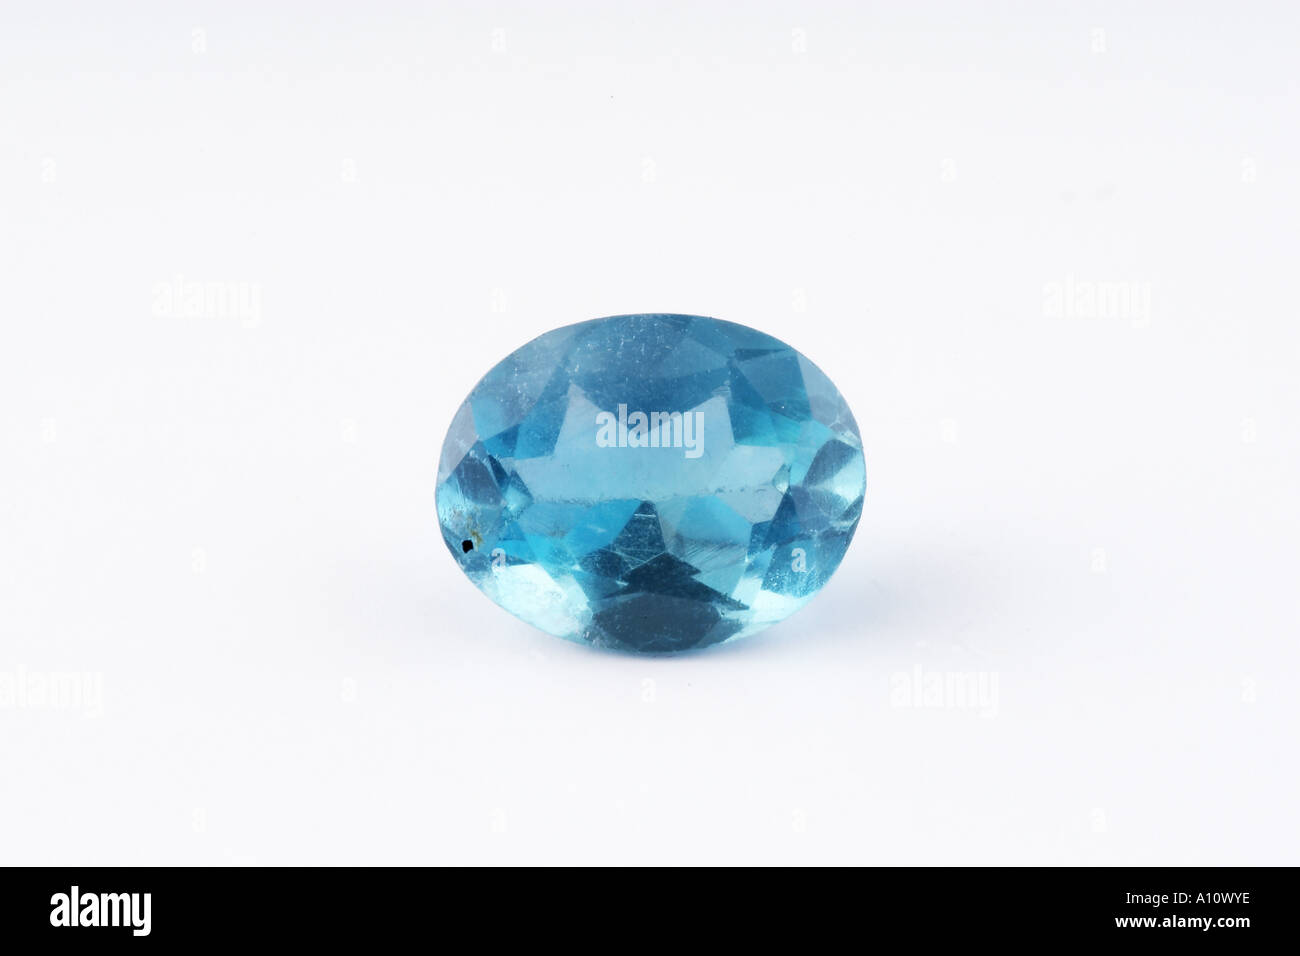 UGA75765 Blue Topaz Semi Precious Stone on white background in studio in India Asia - Stock Image